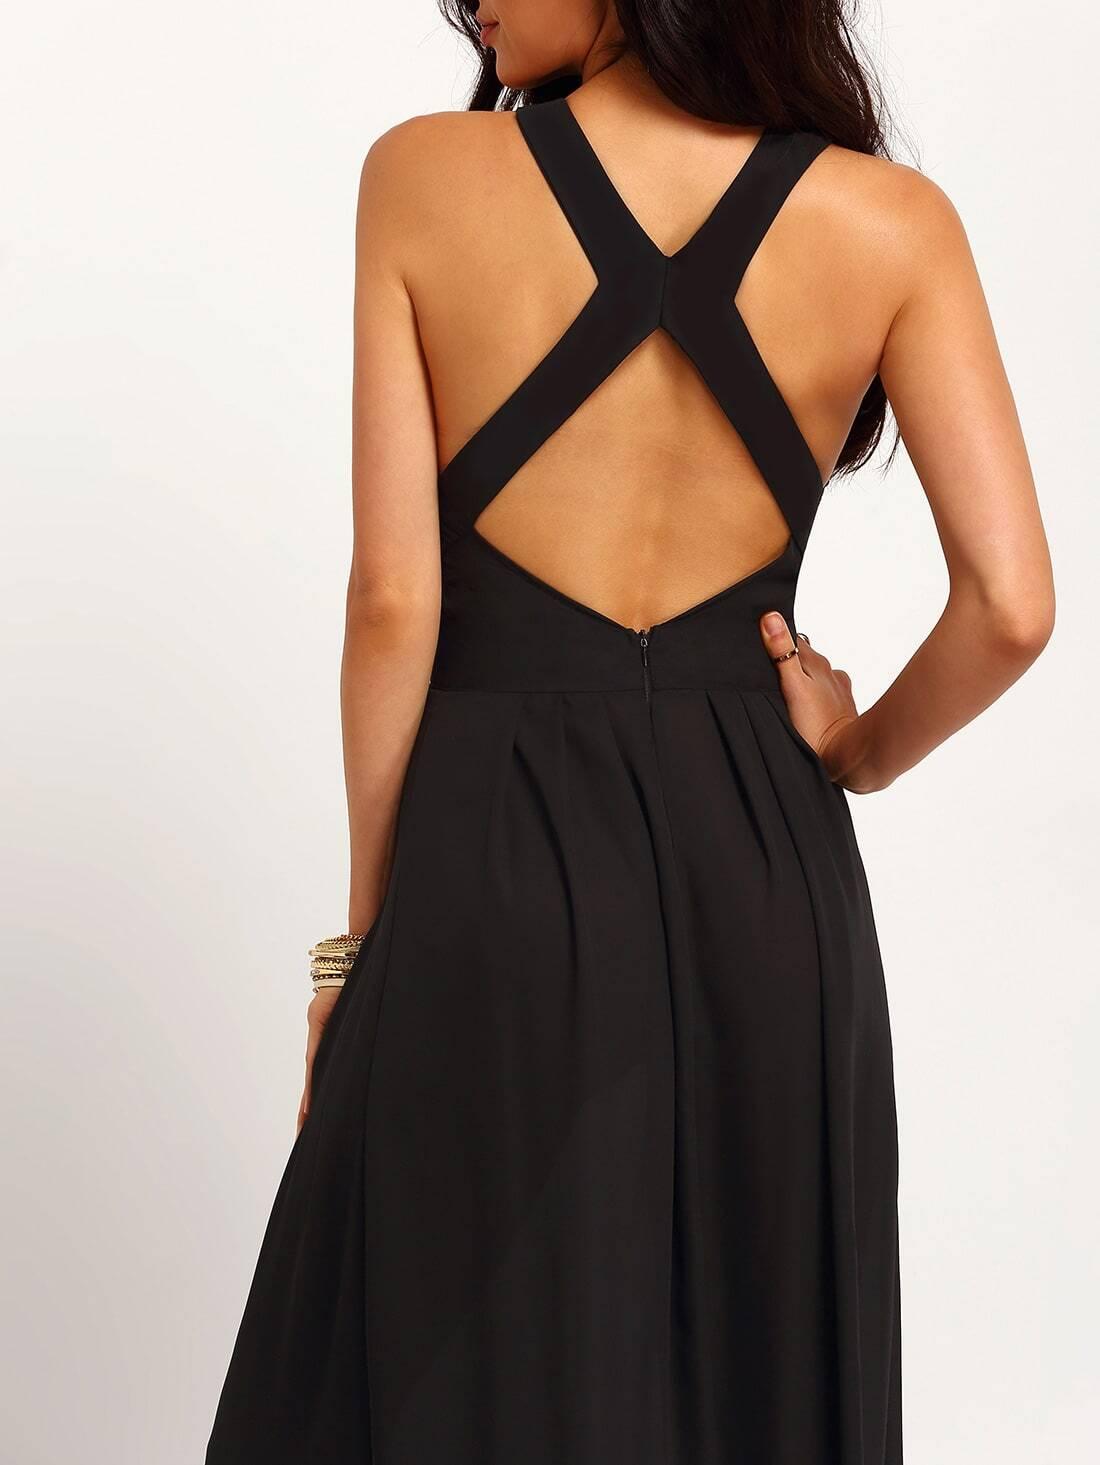 Black Criss Cross Back Backless Maxi Dress Shein Sheinside